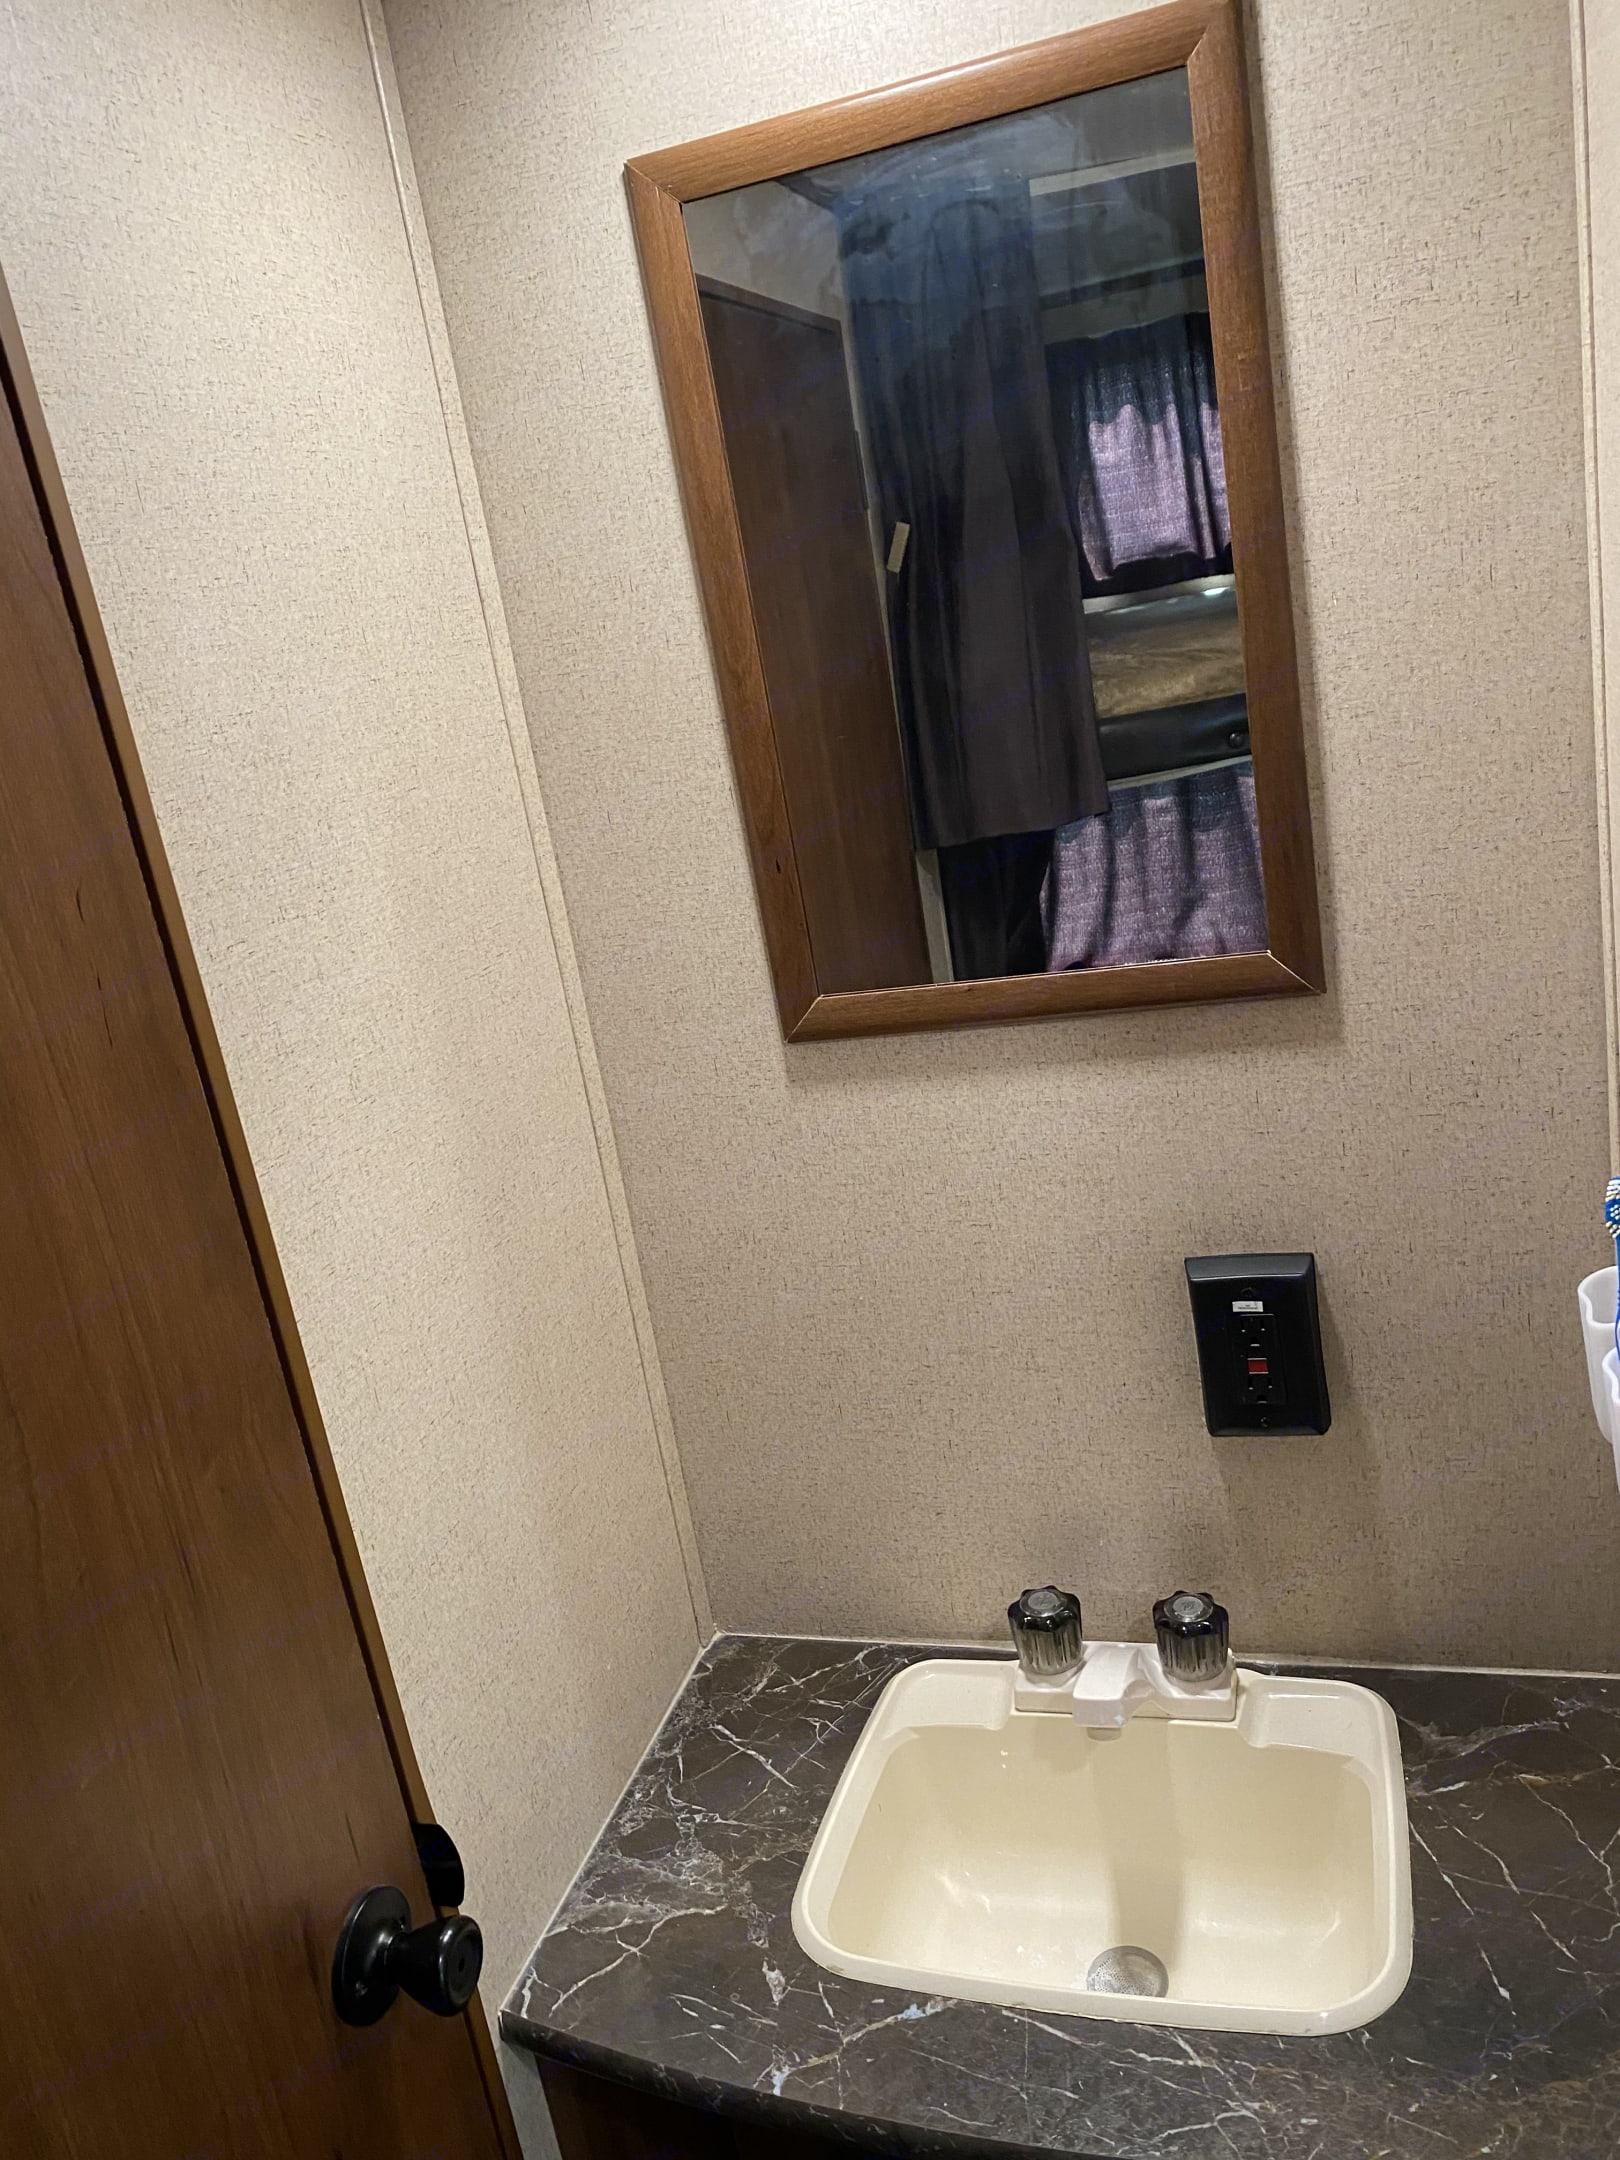 Sink is separated from bathroom. Jayco Flight 2016